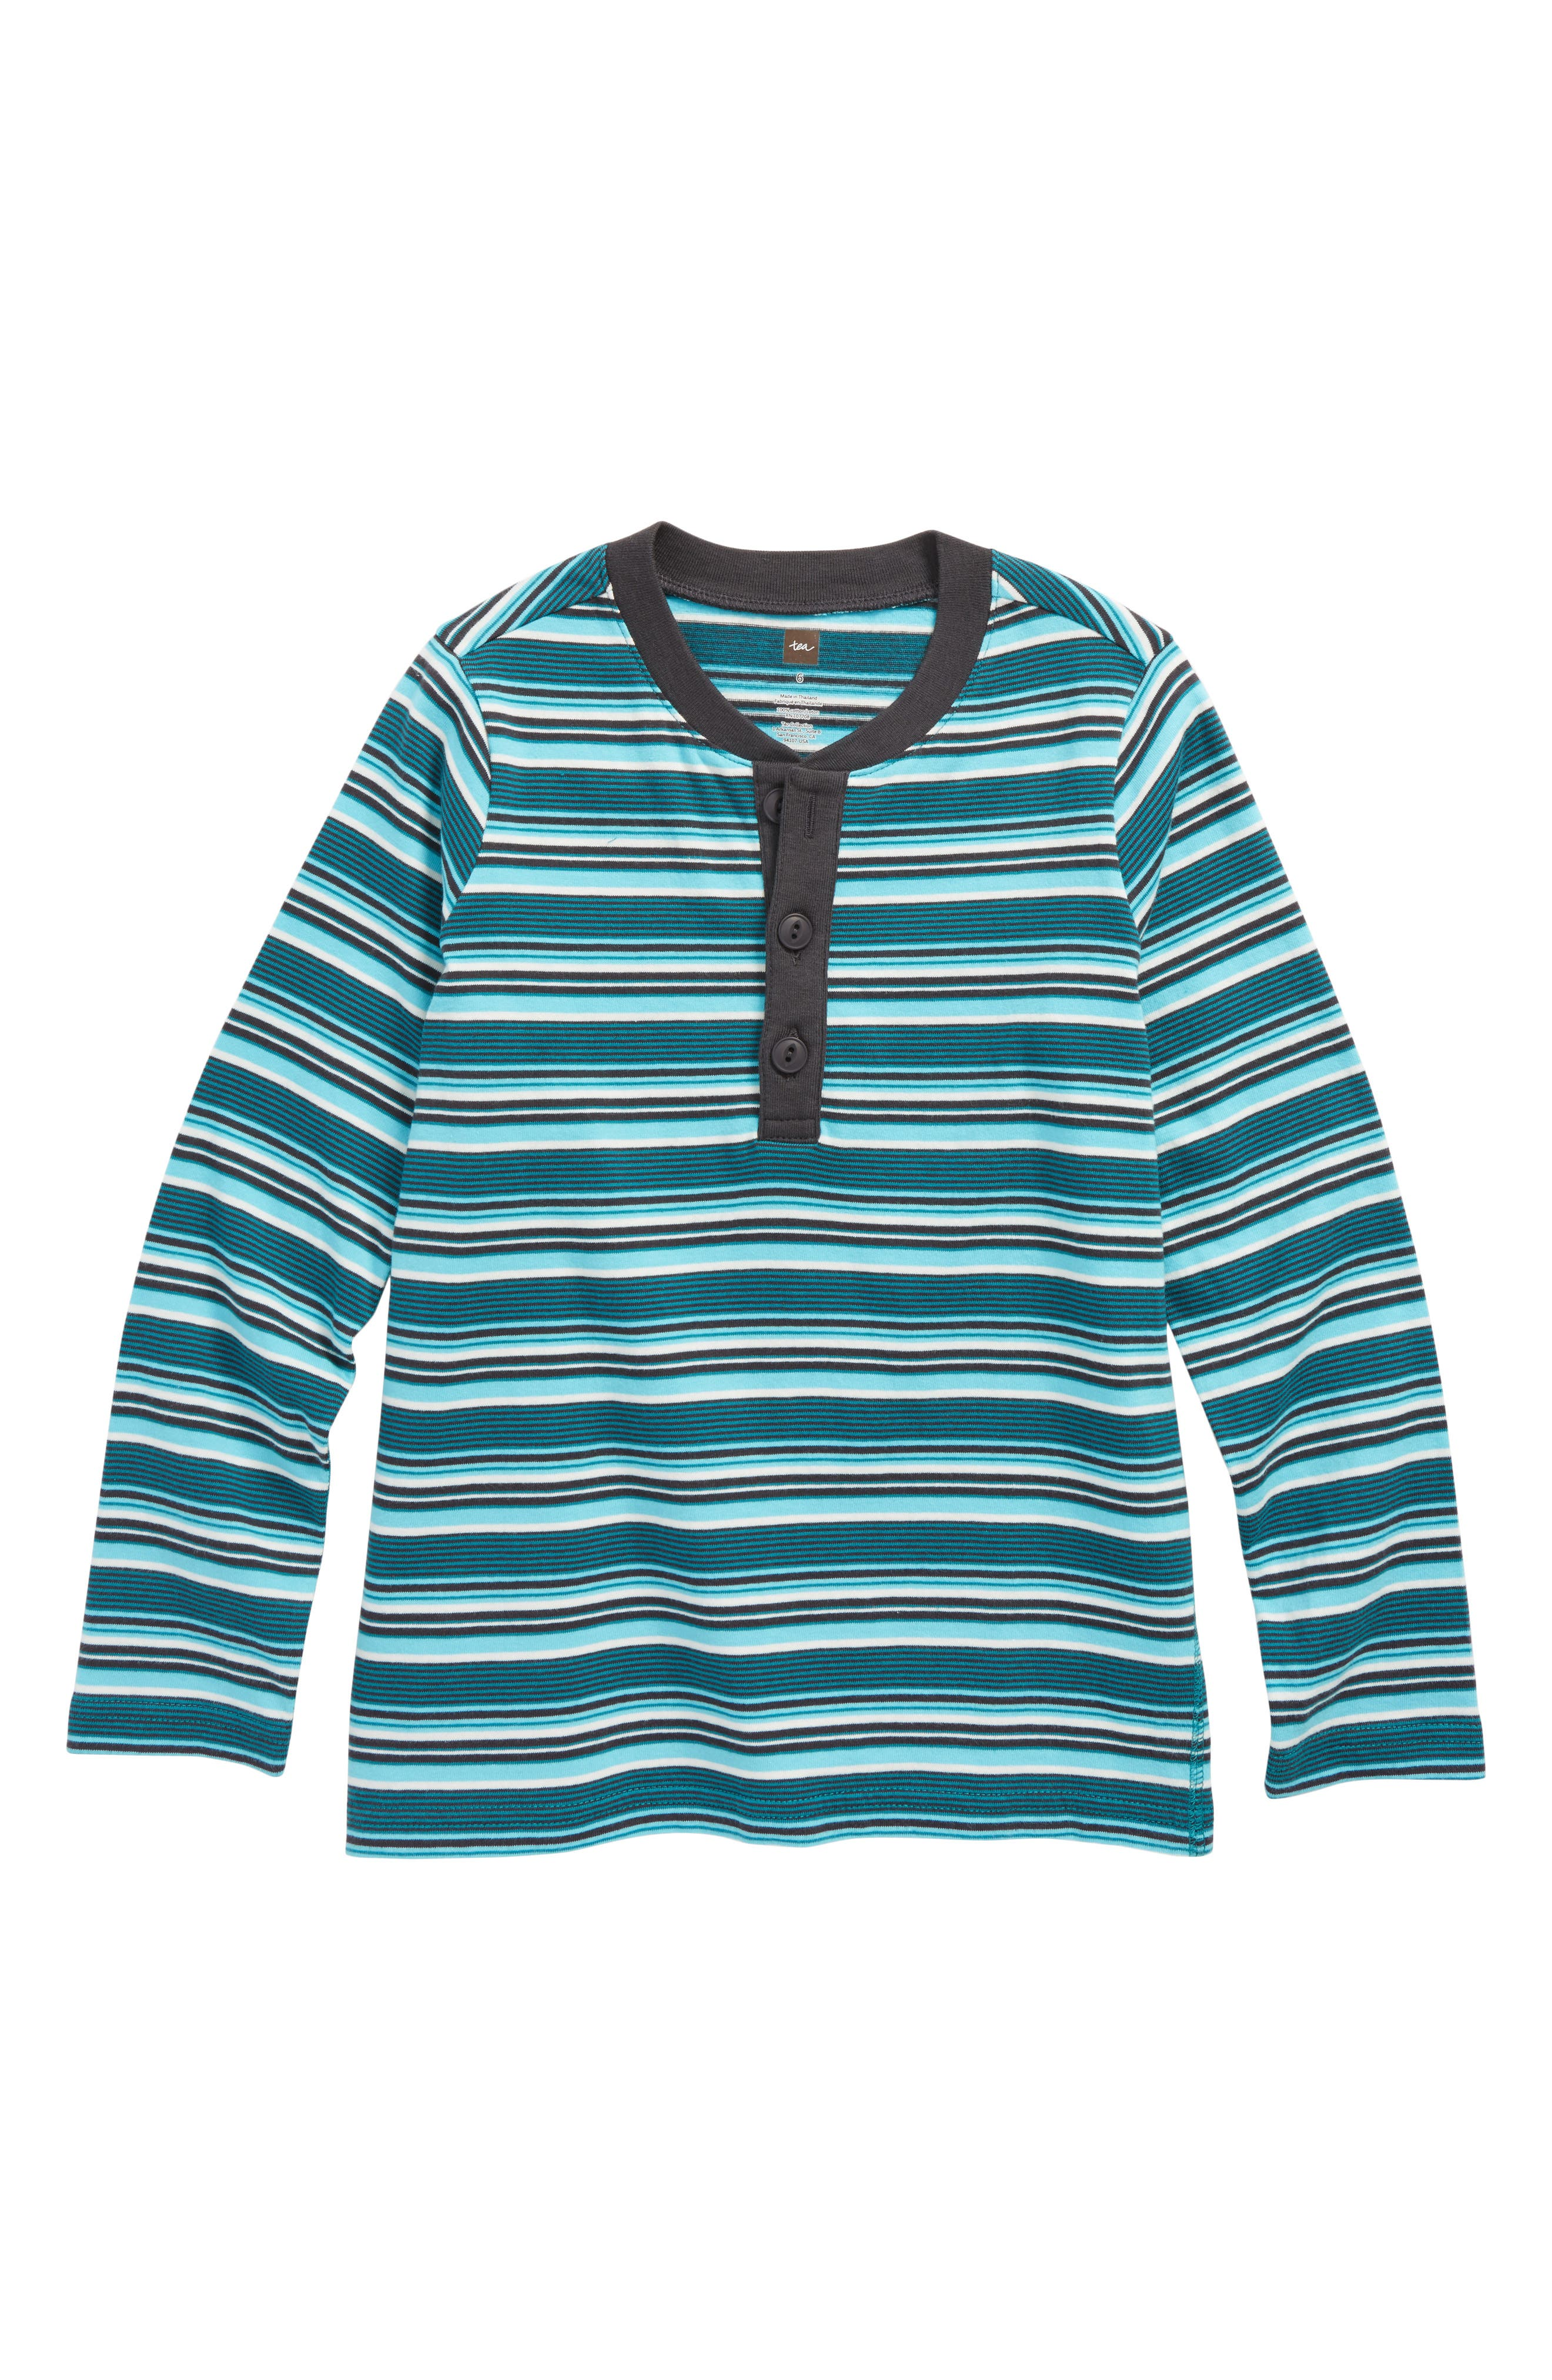 Main Image - Tea Collection Ugie Stripe Henley T-Shirt (Toddler Boys & Little Boys)